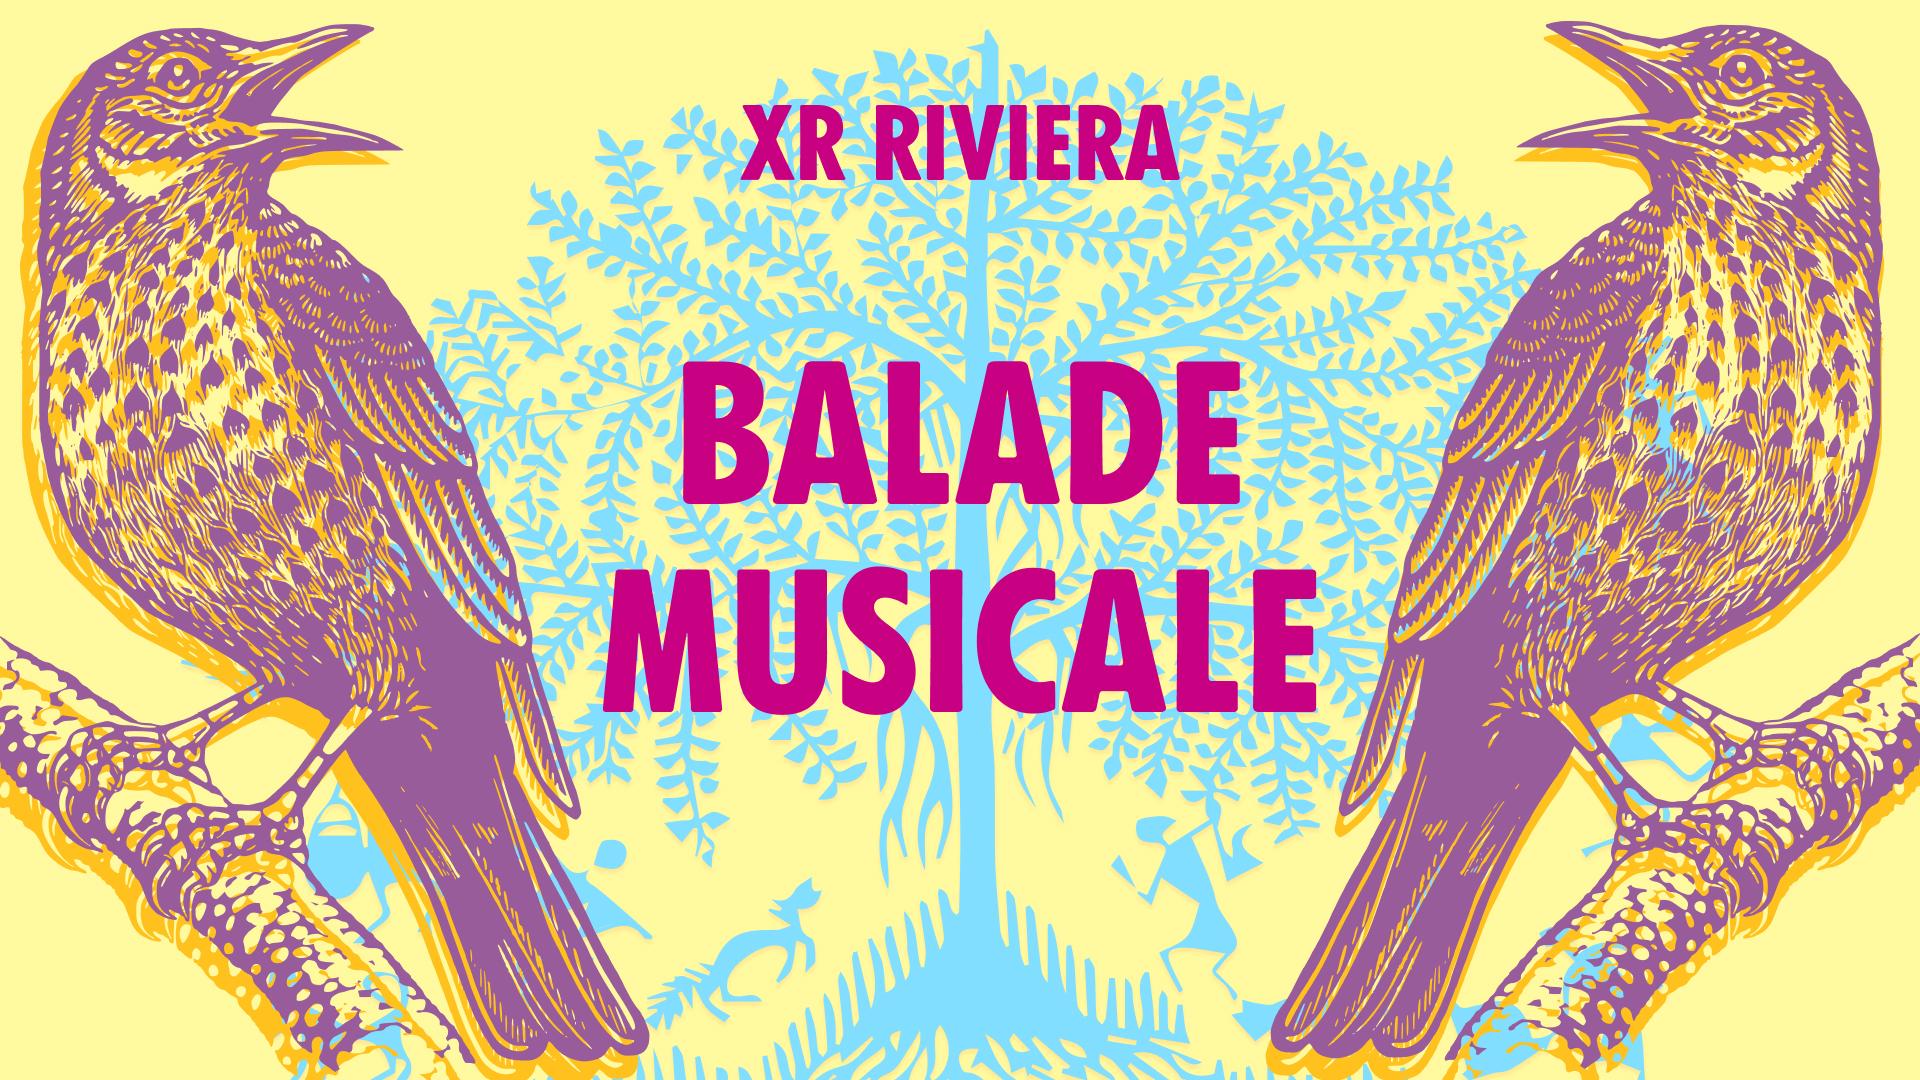 Balade musicale XR Riviera